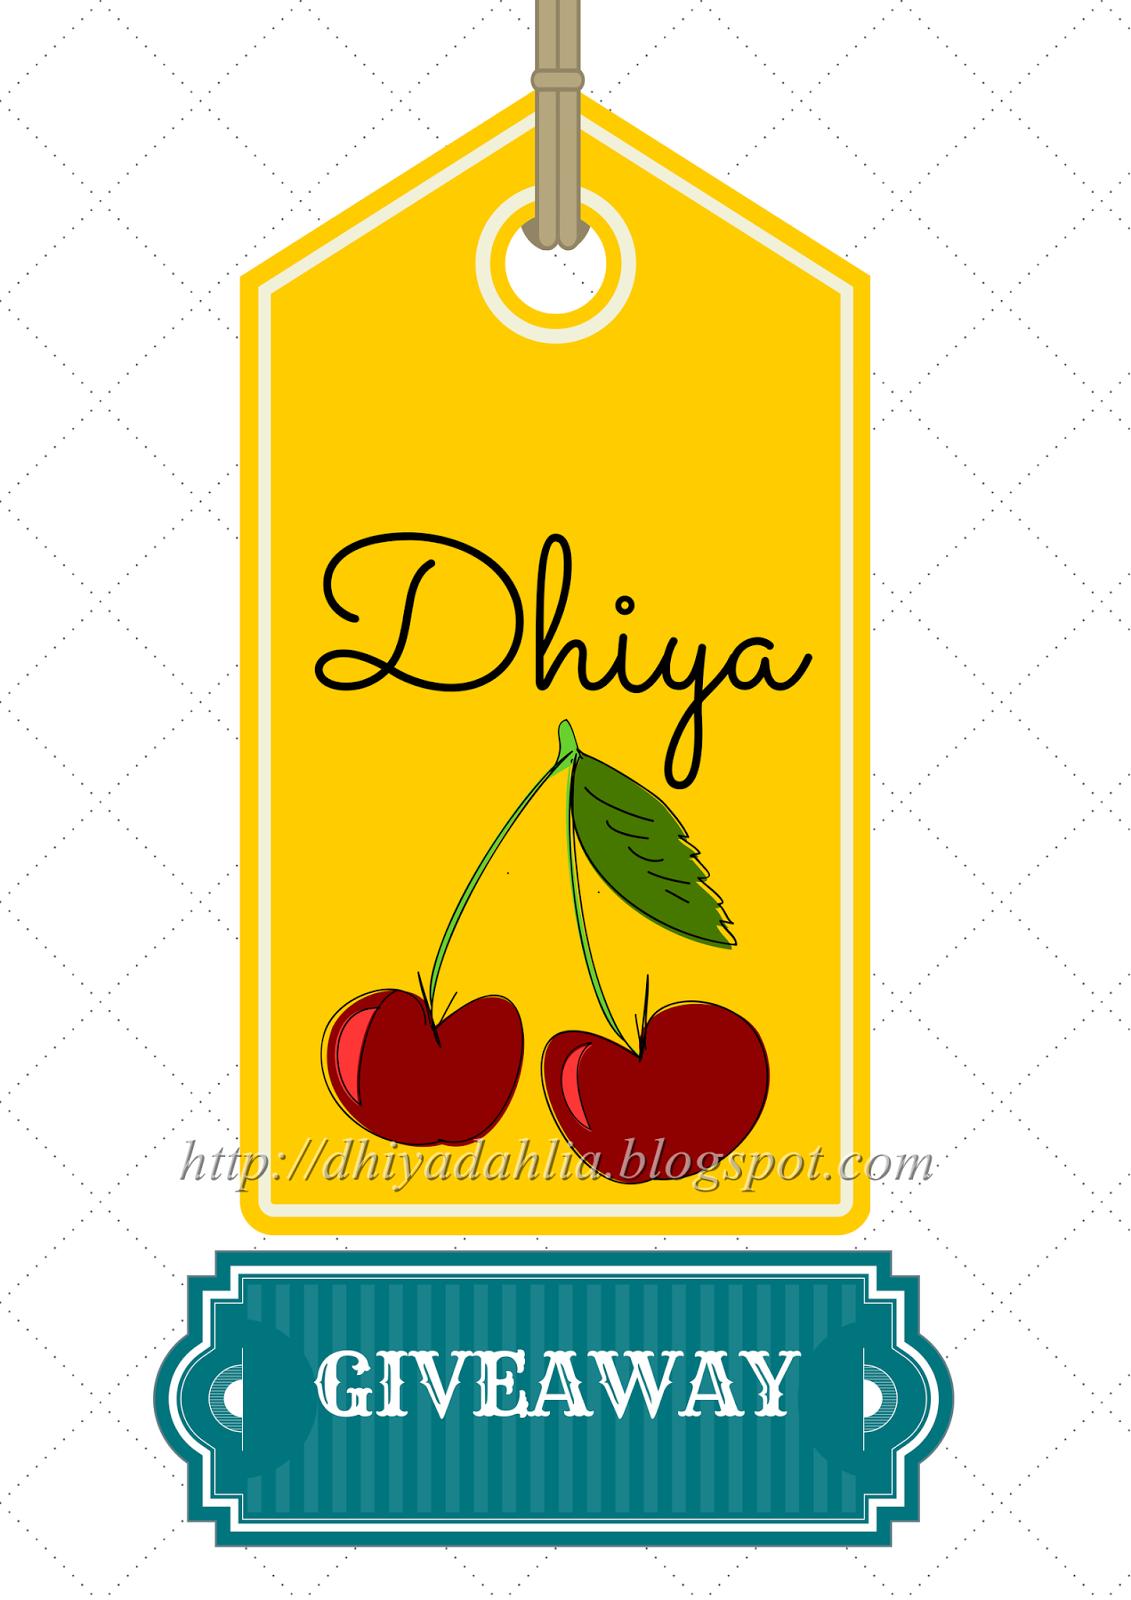 http://secebiscoretanqalbi.blogspot.com/2014/08/dhiyas-first-giveaway.html